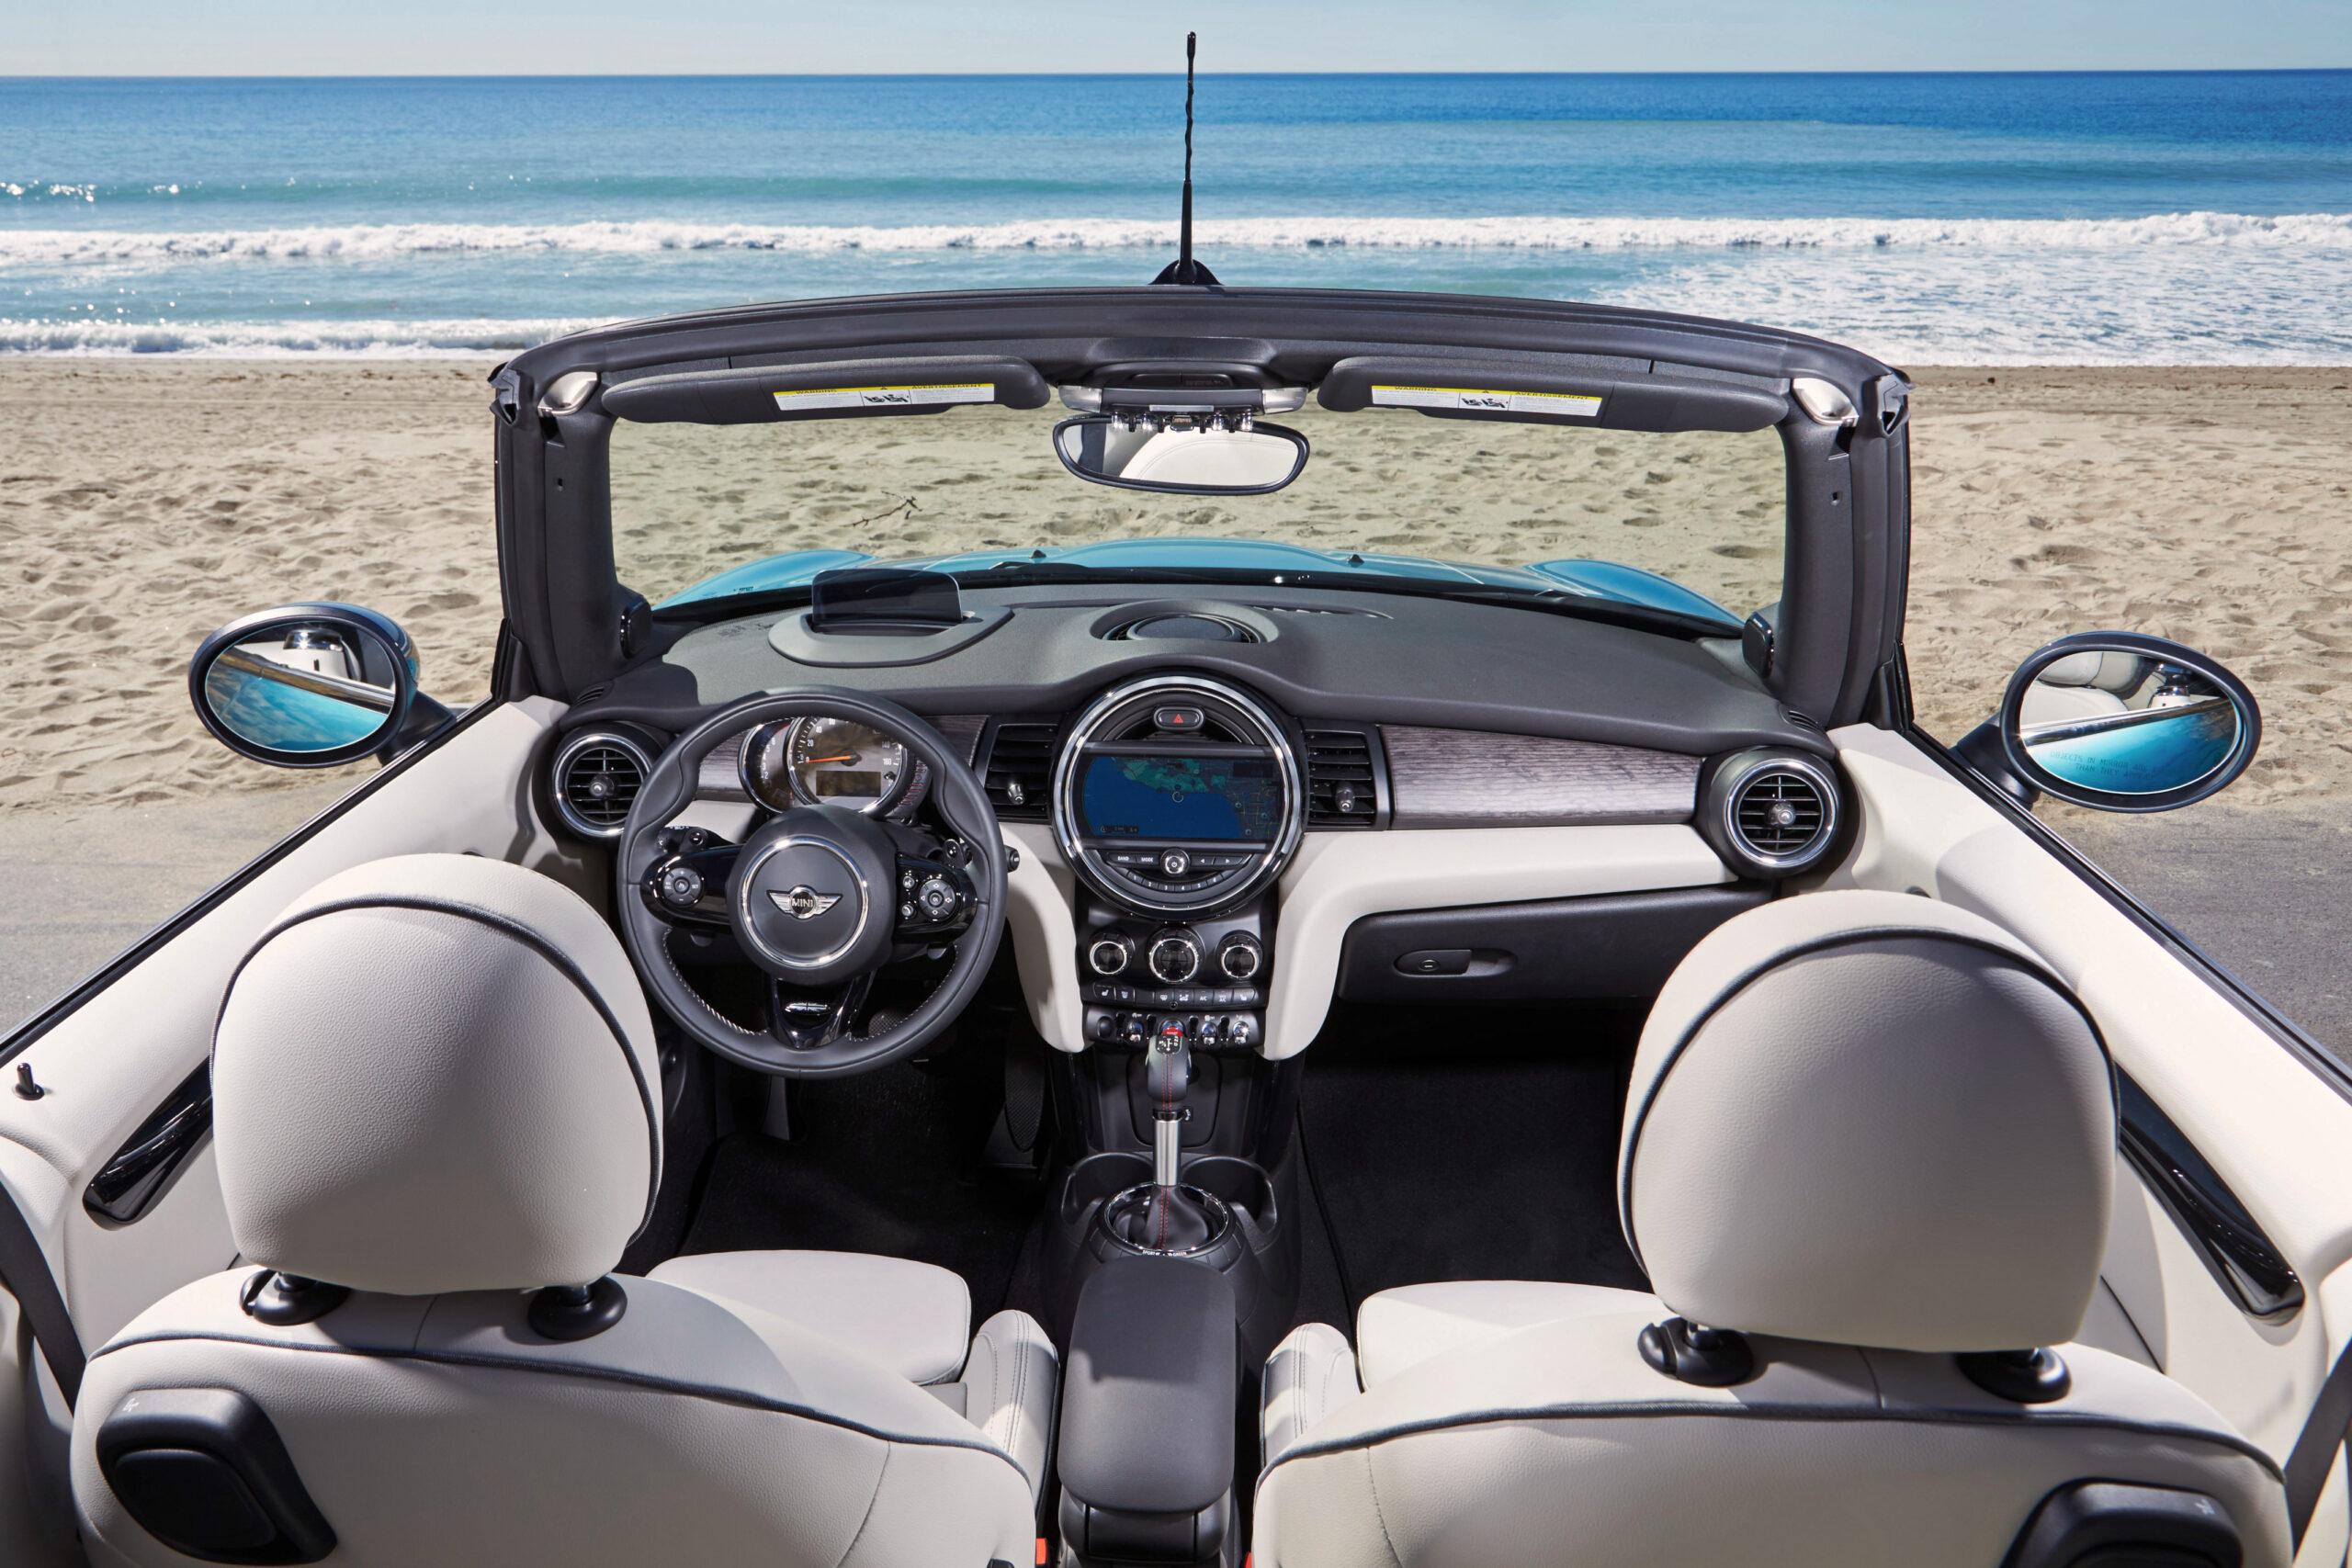 2021 Mini Cooper Convertible white ivory interior, Aqua Caribbean blue exterior -  facing beach   BEST Road-Trip Cars of 2020